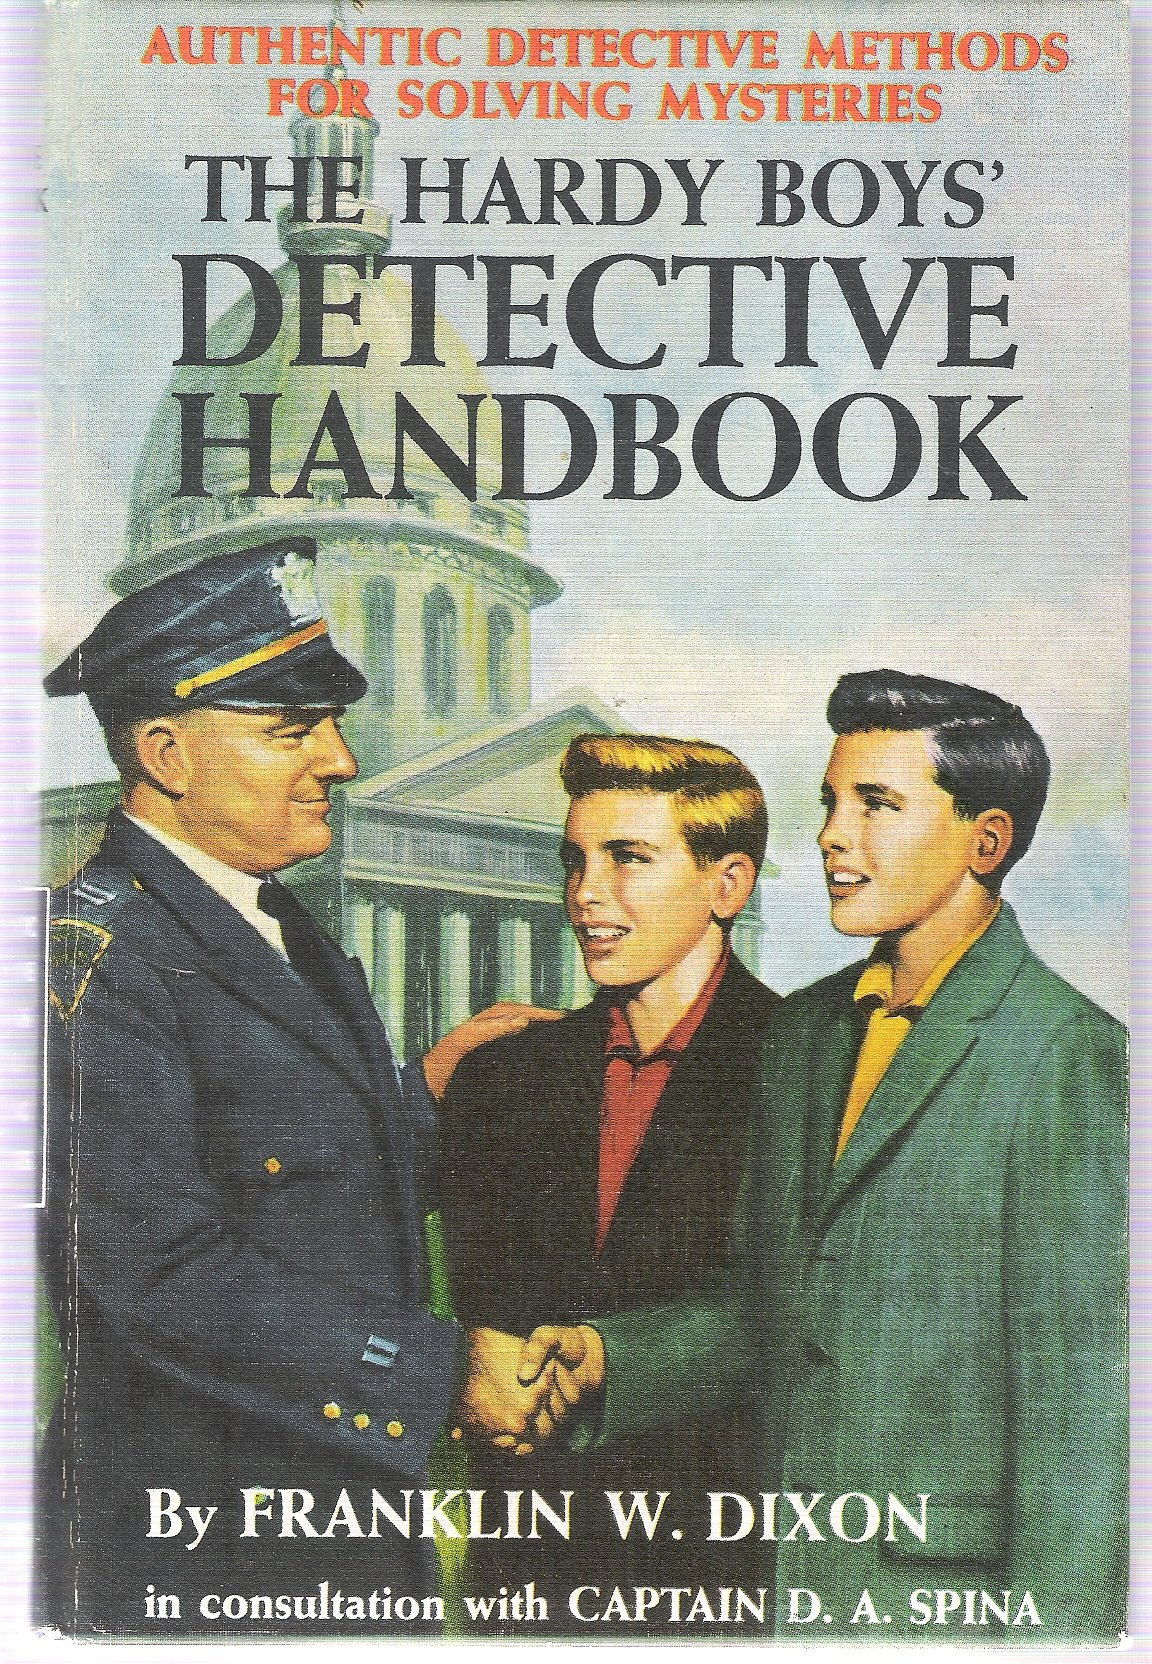 THE HARDY BOYS' DETECTIVE HANDBOOK: Franklin W  Dixon